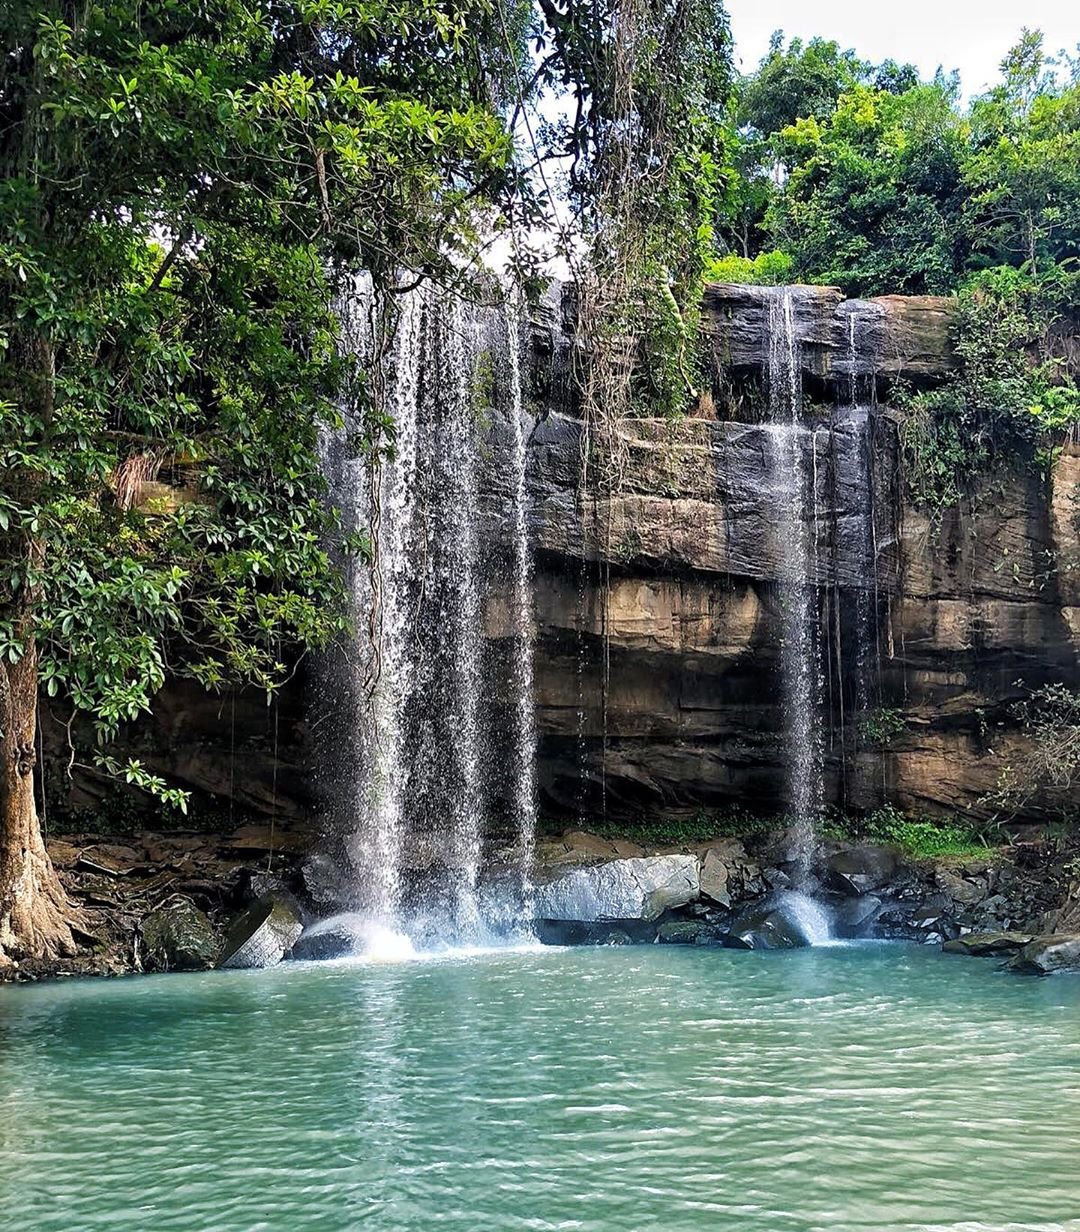 Shimba Hills National Reserve - CasoLodge Travels & Safaris LTD